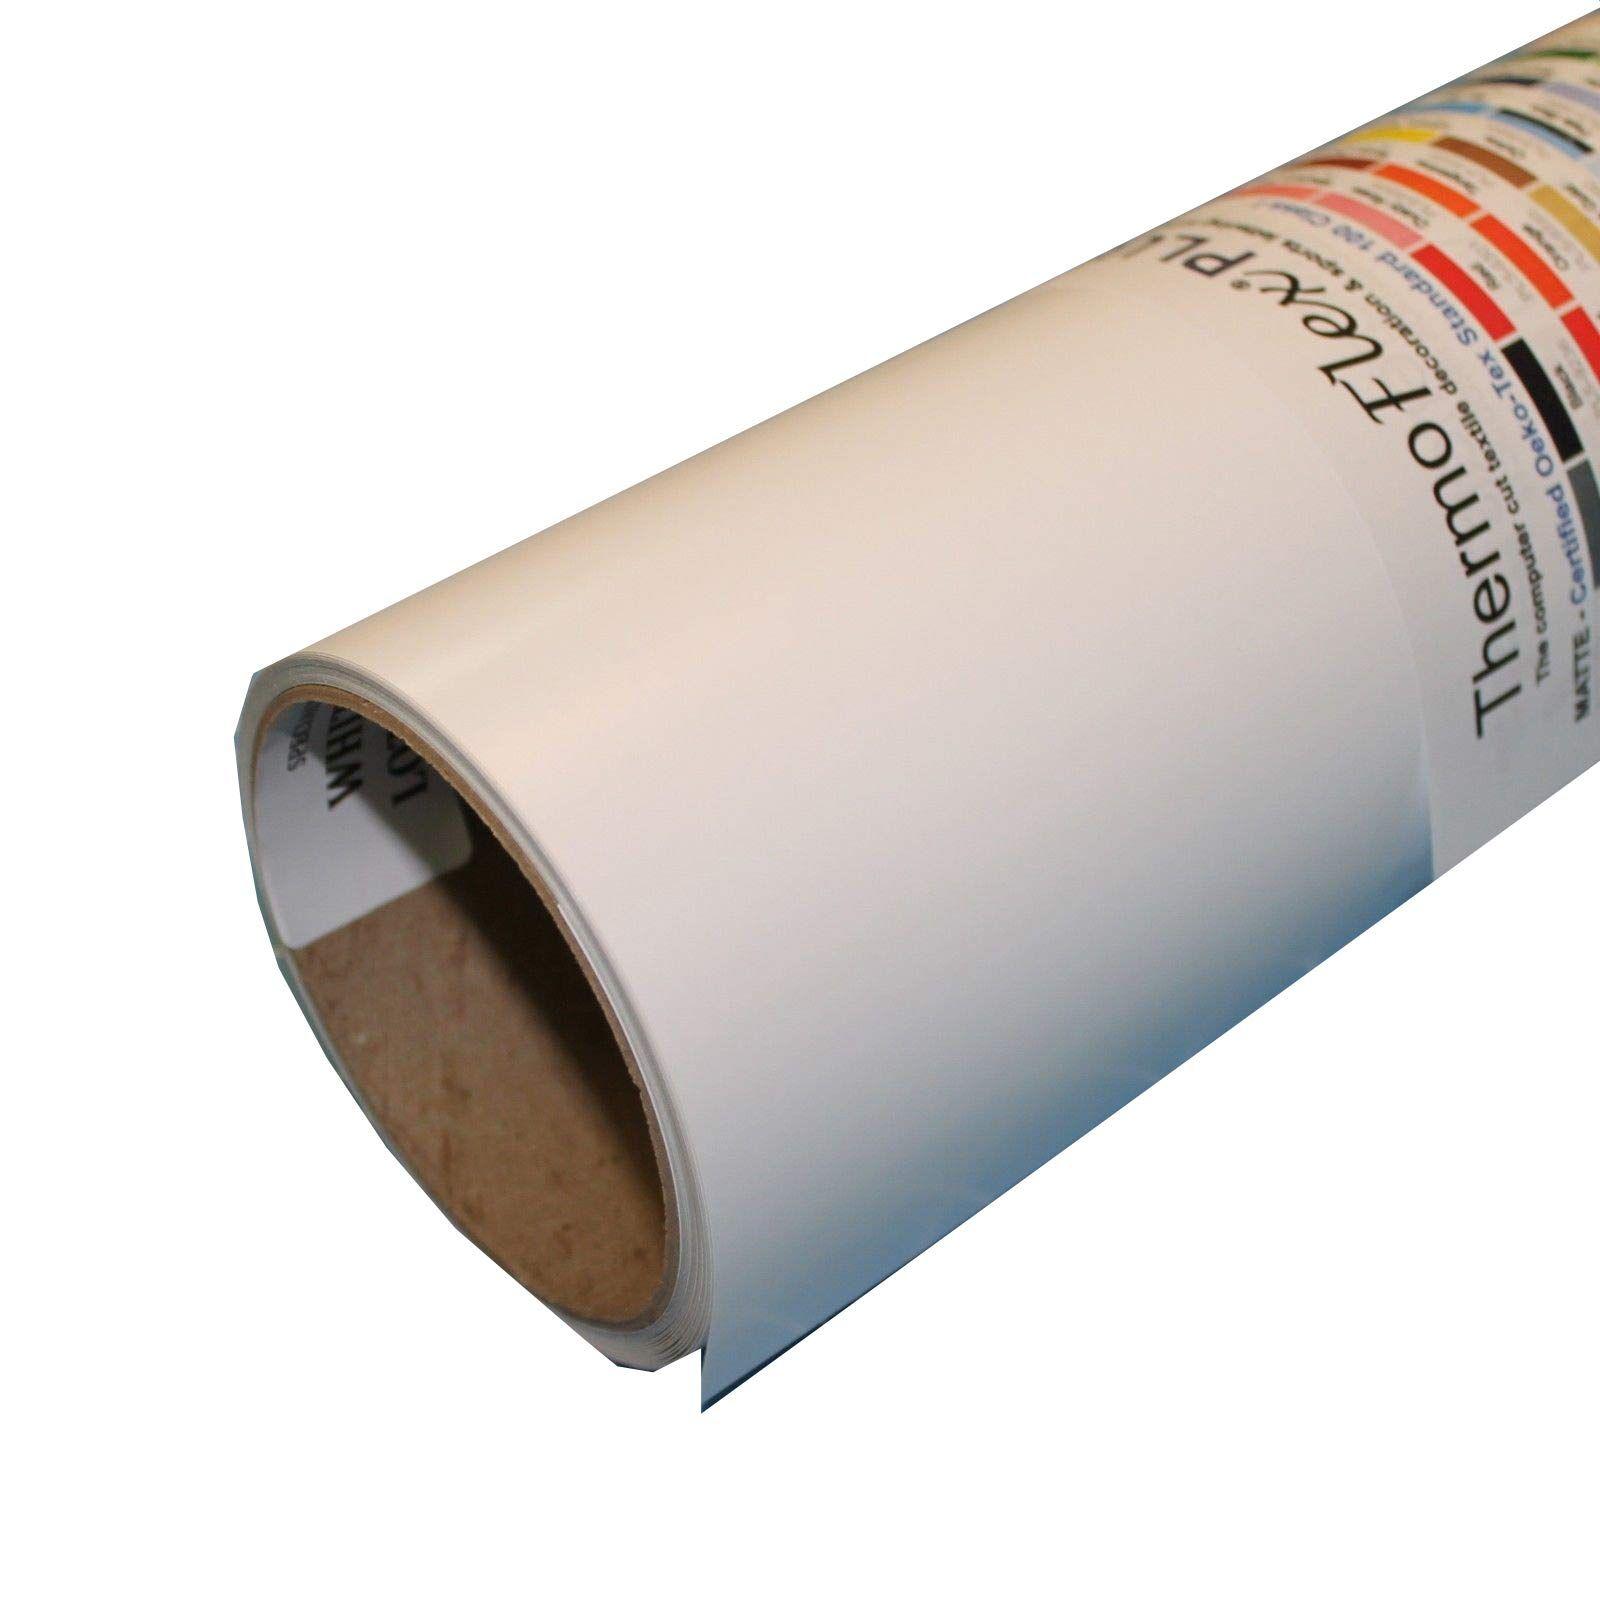 Thermoflex Plus 15 X 15 Roll White Heat Transfer Vinyl Ad Roll Affiliate Thermoflex White Vinyl Heat Transfer Vinyl Vinyl Sewing Stores